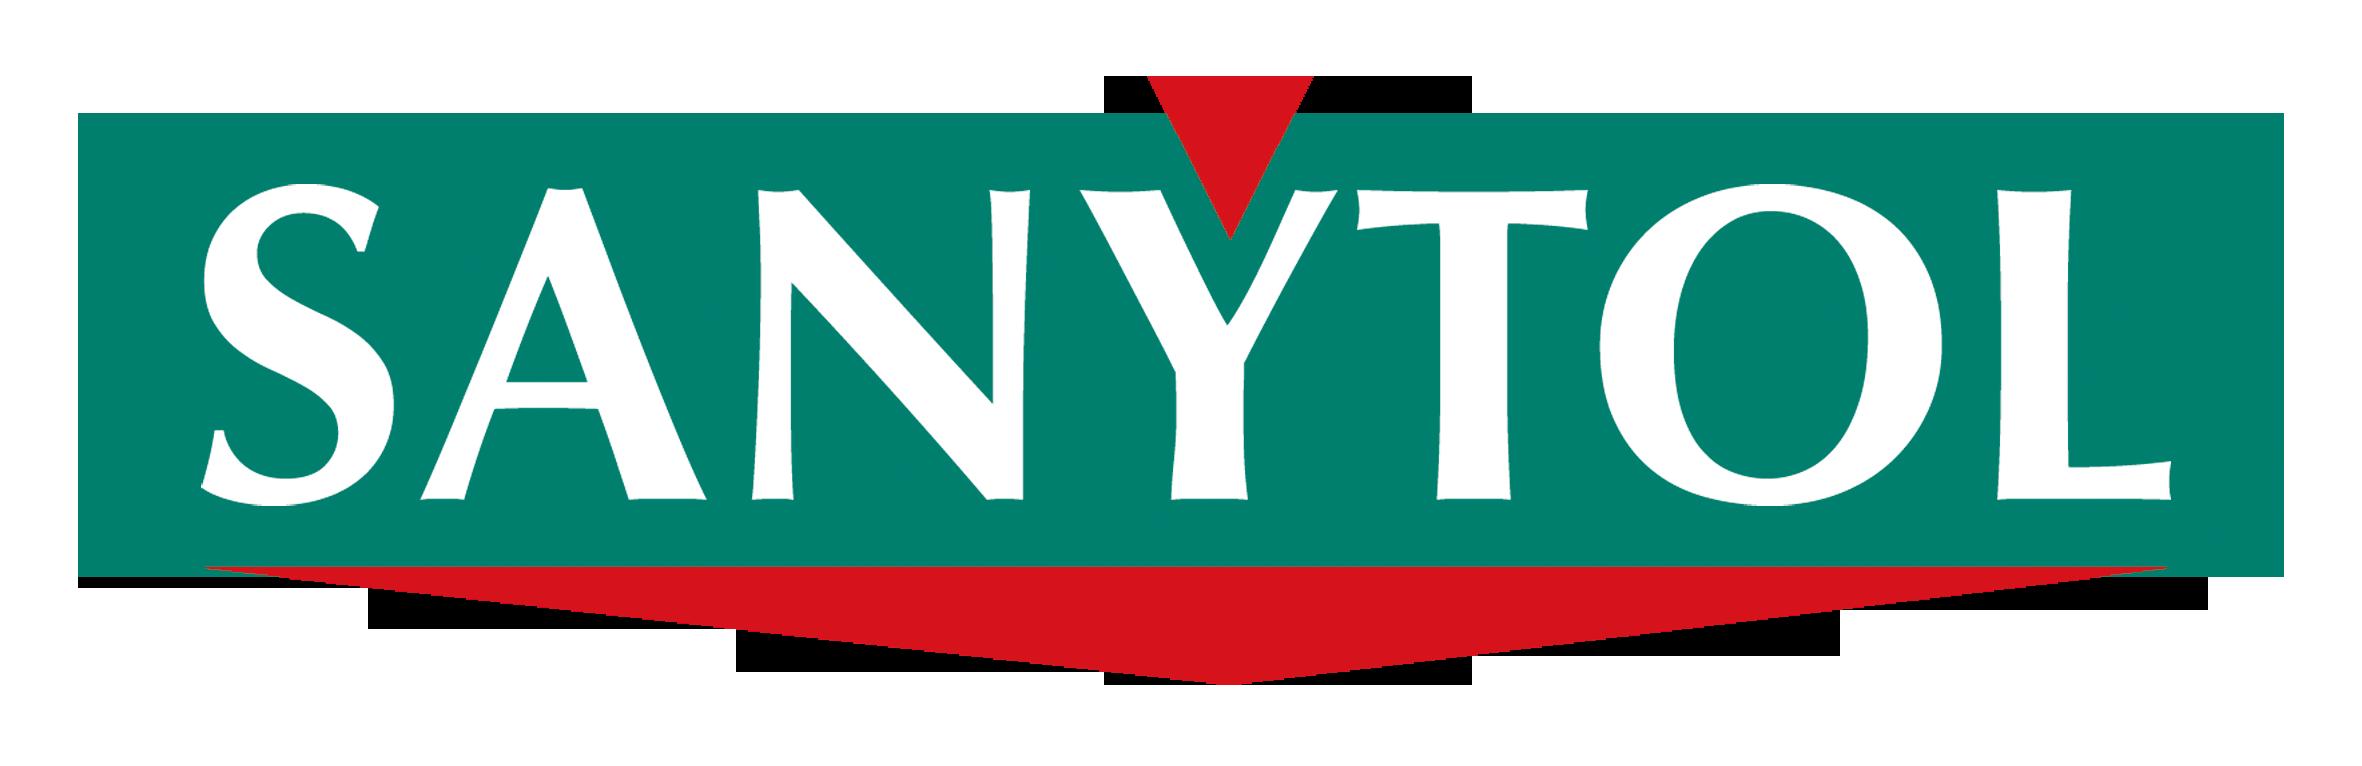 Sanytol logo